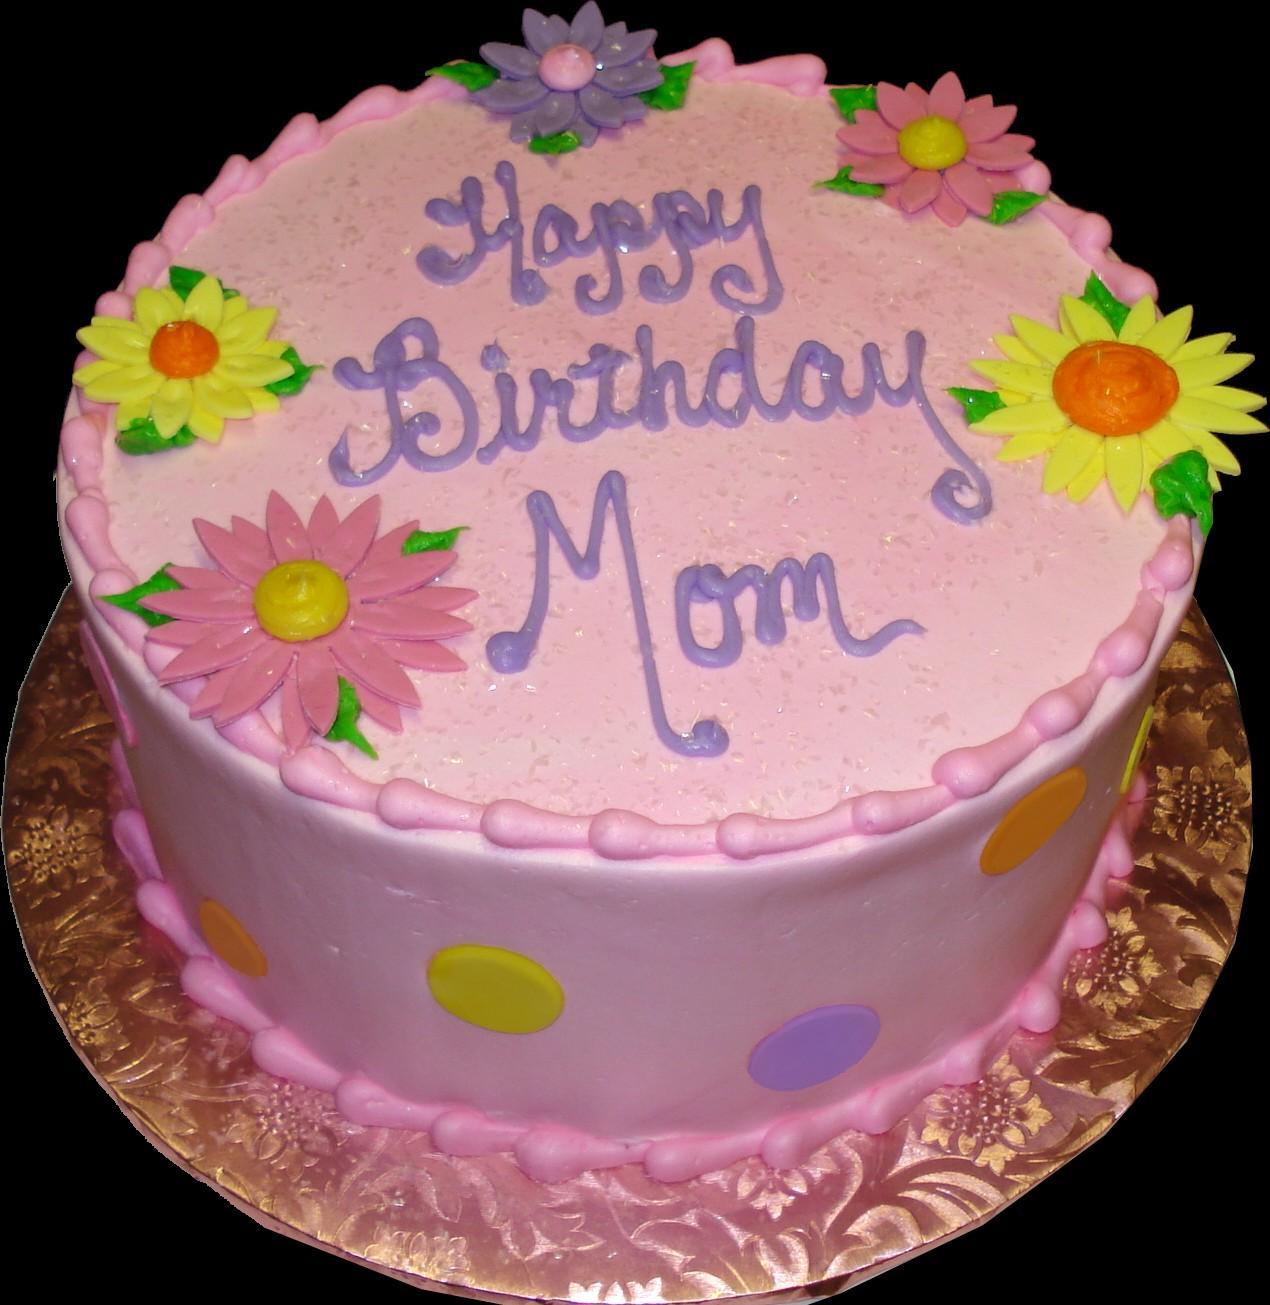 Strange 11 Round Buttercream Birthday Cakes Photo Birthday Cake Slice Funny Birthday Cards Online Barepcheapnameinfo